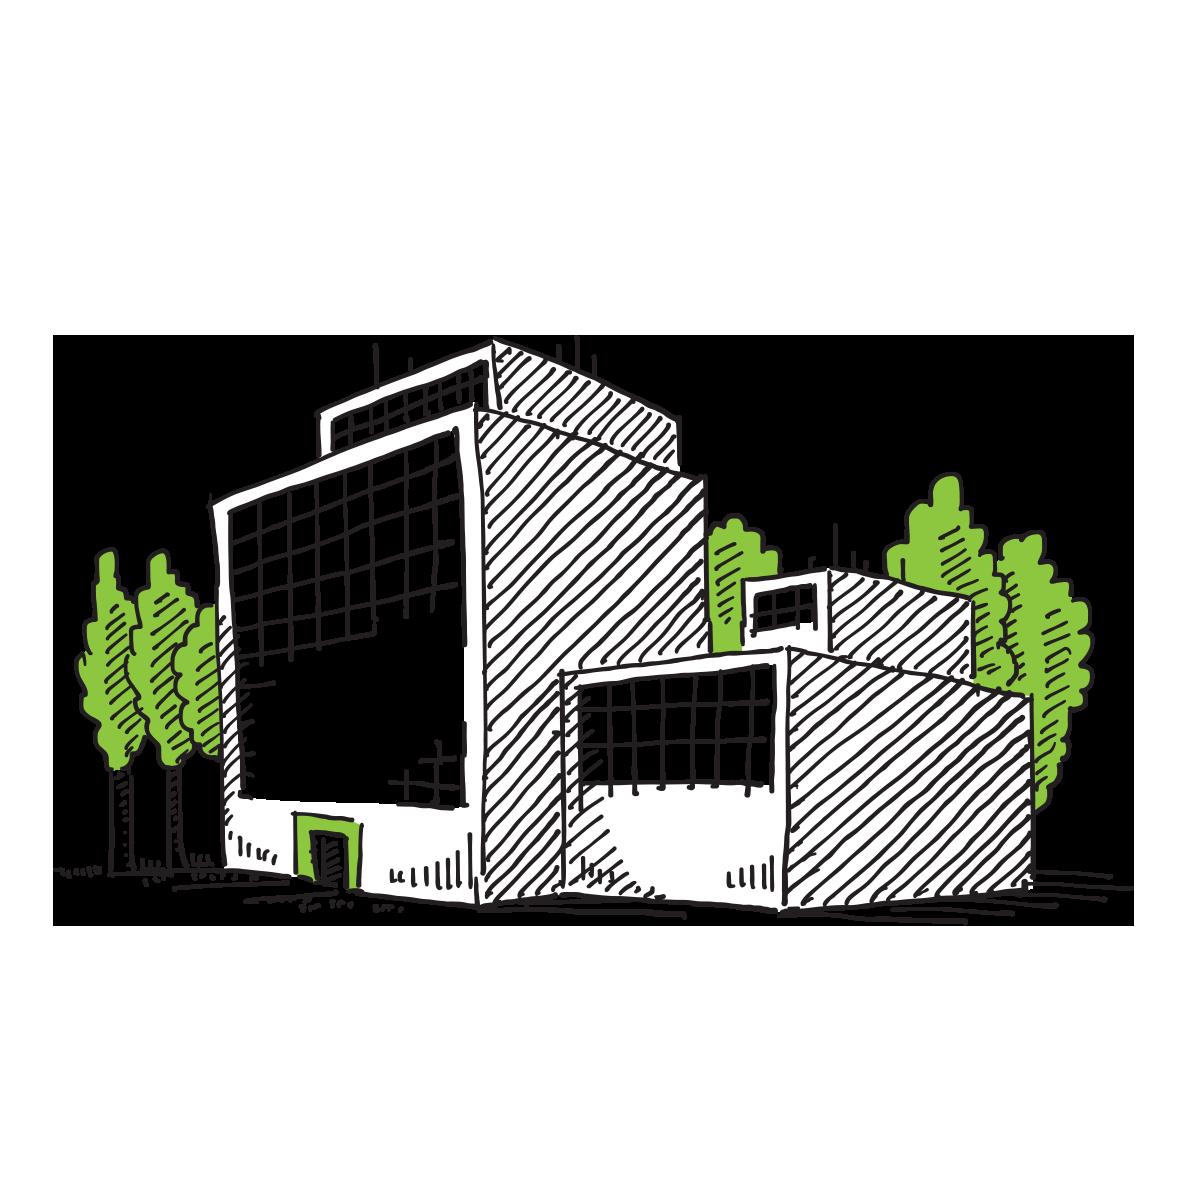 Sheltons Solicitors |  Building Illustration